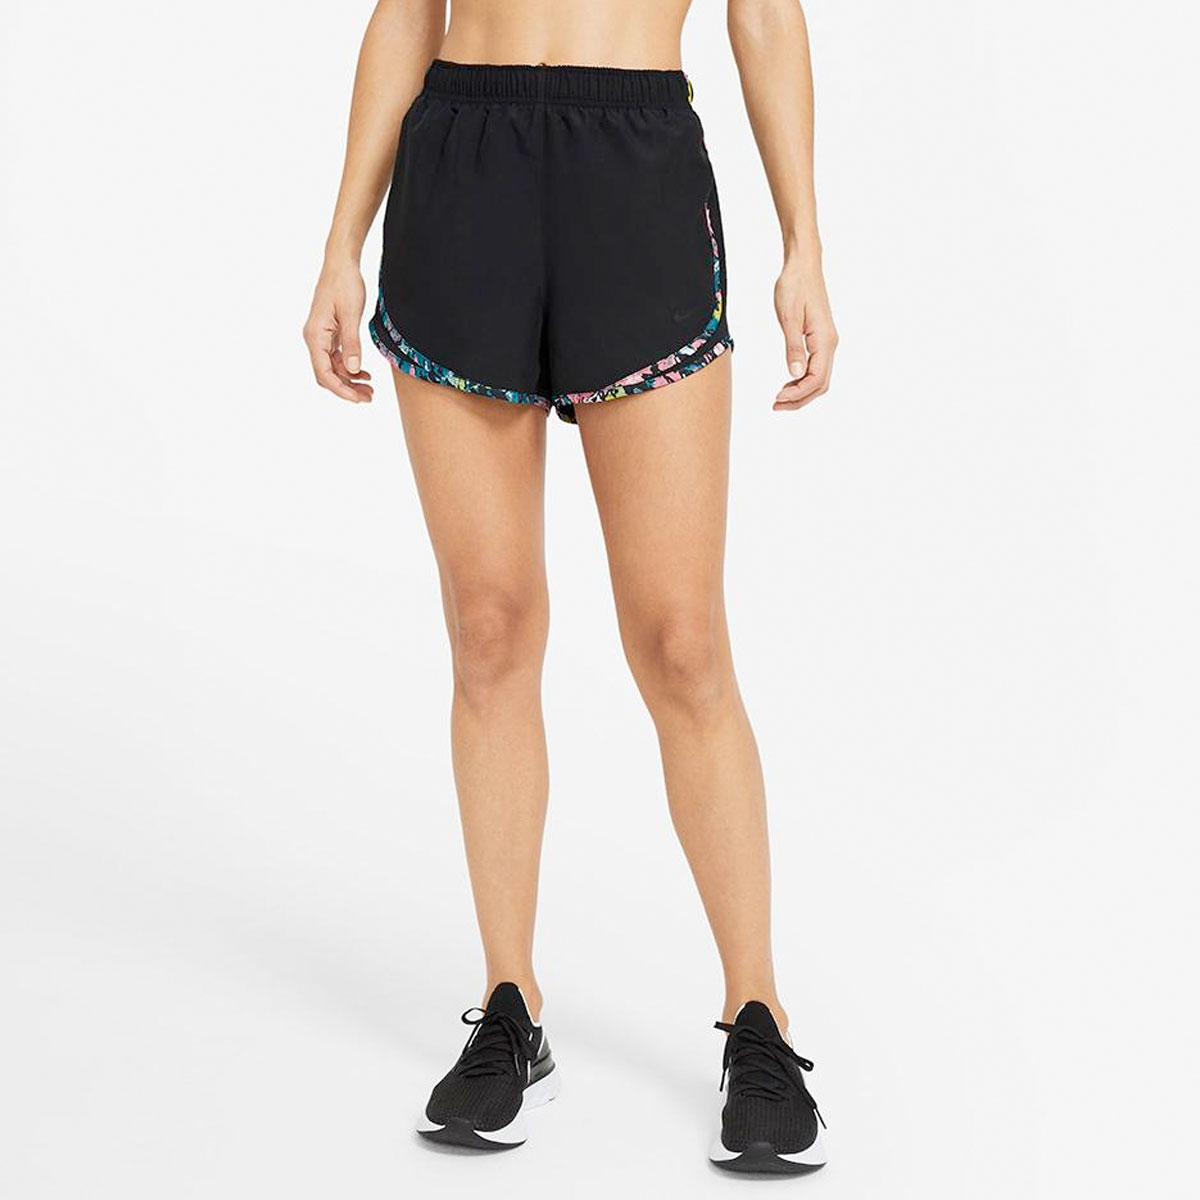 Women's Tempo Shorts, Black/Black, swatch